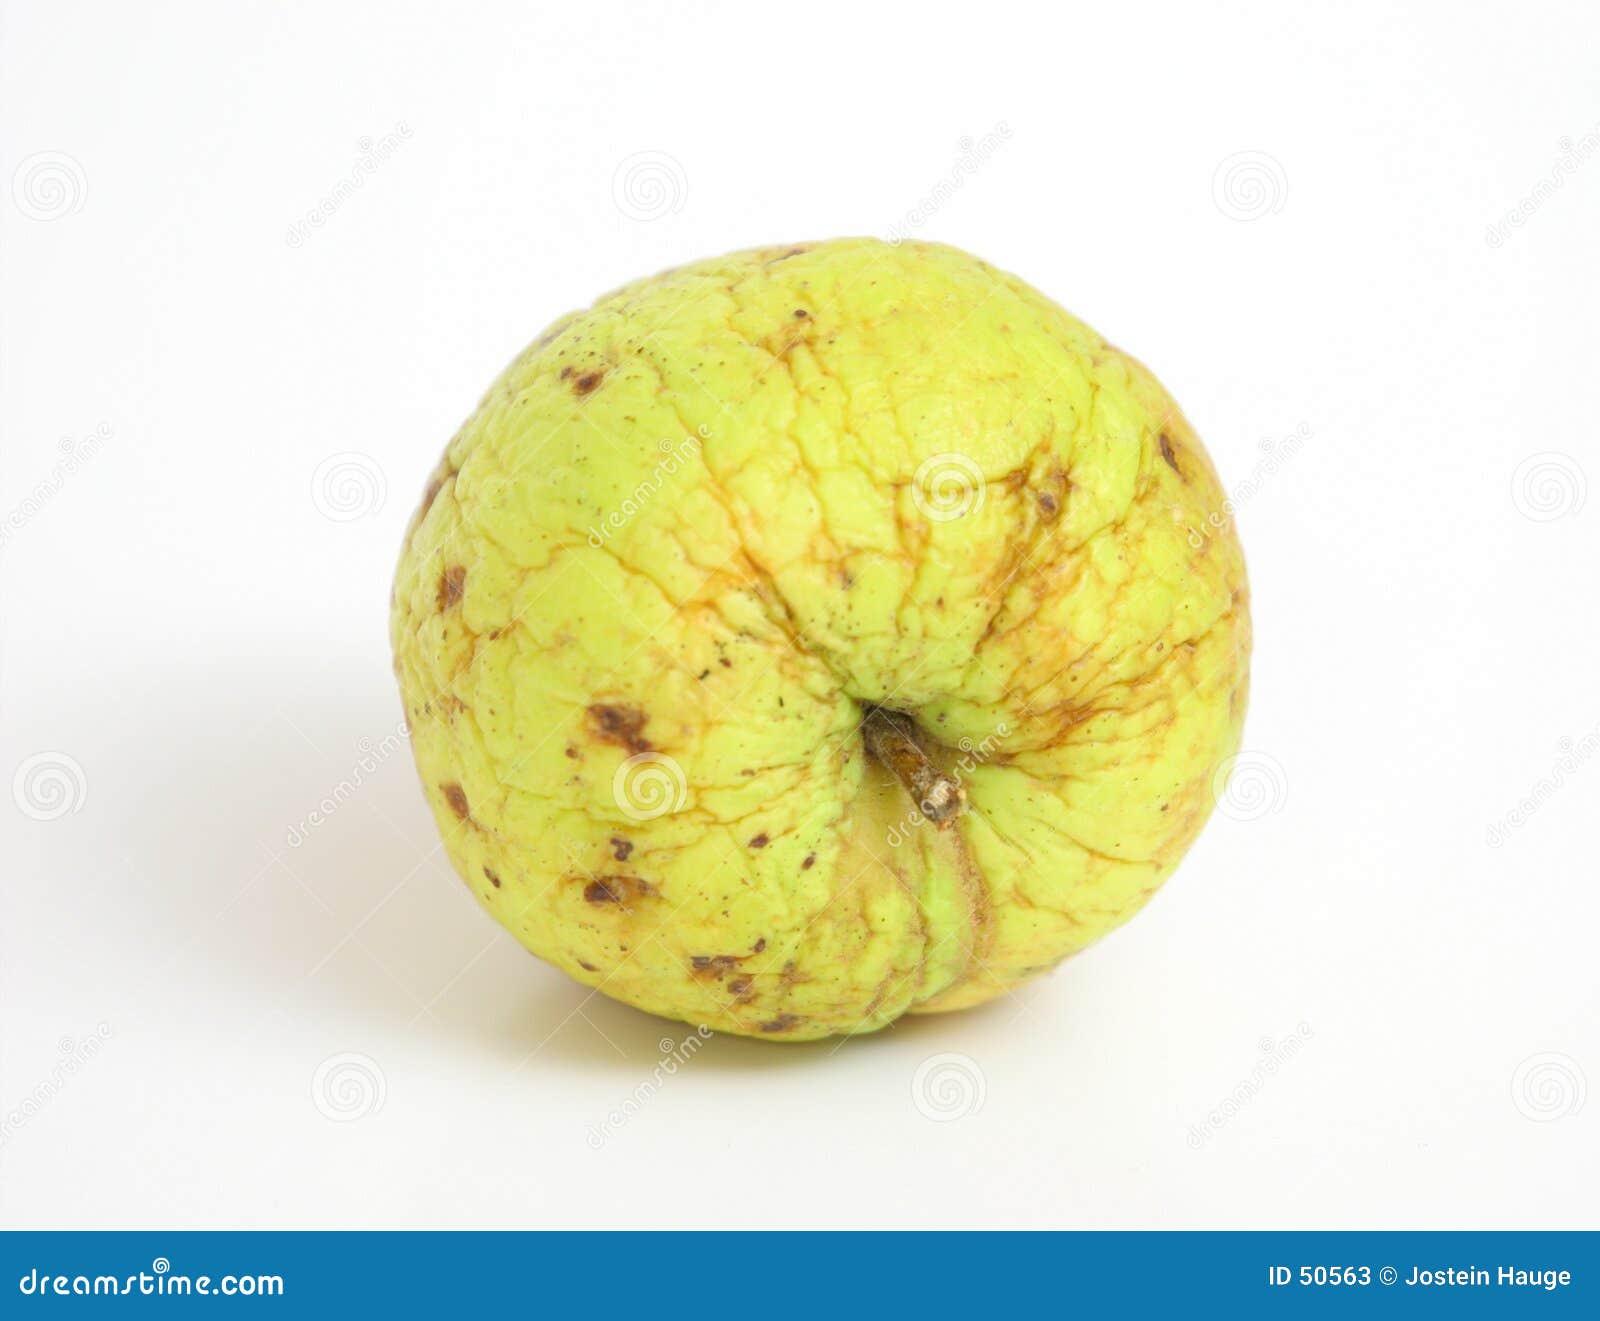 Rynkat äpple